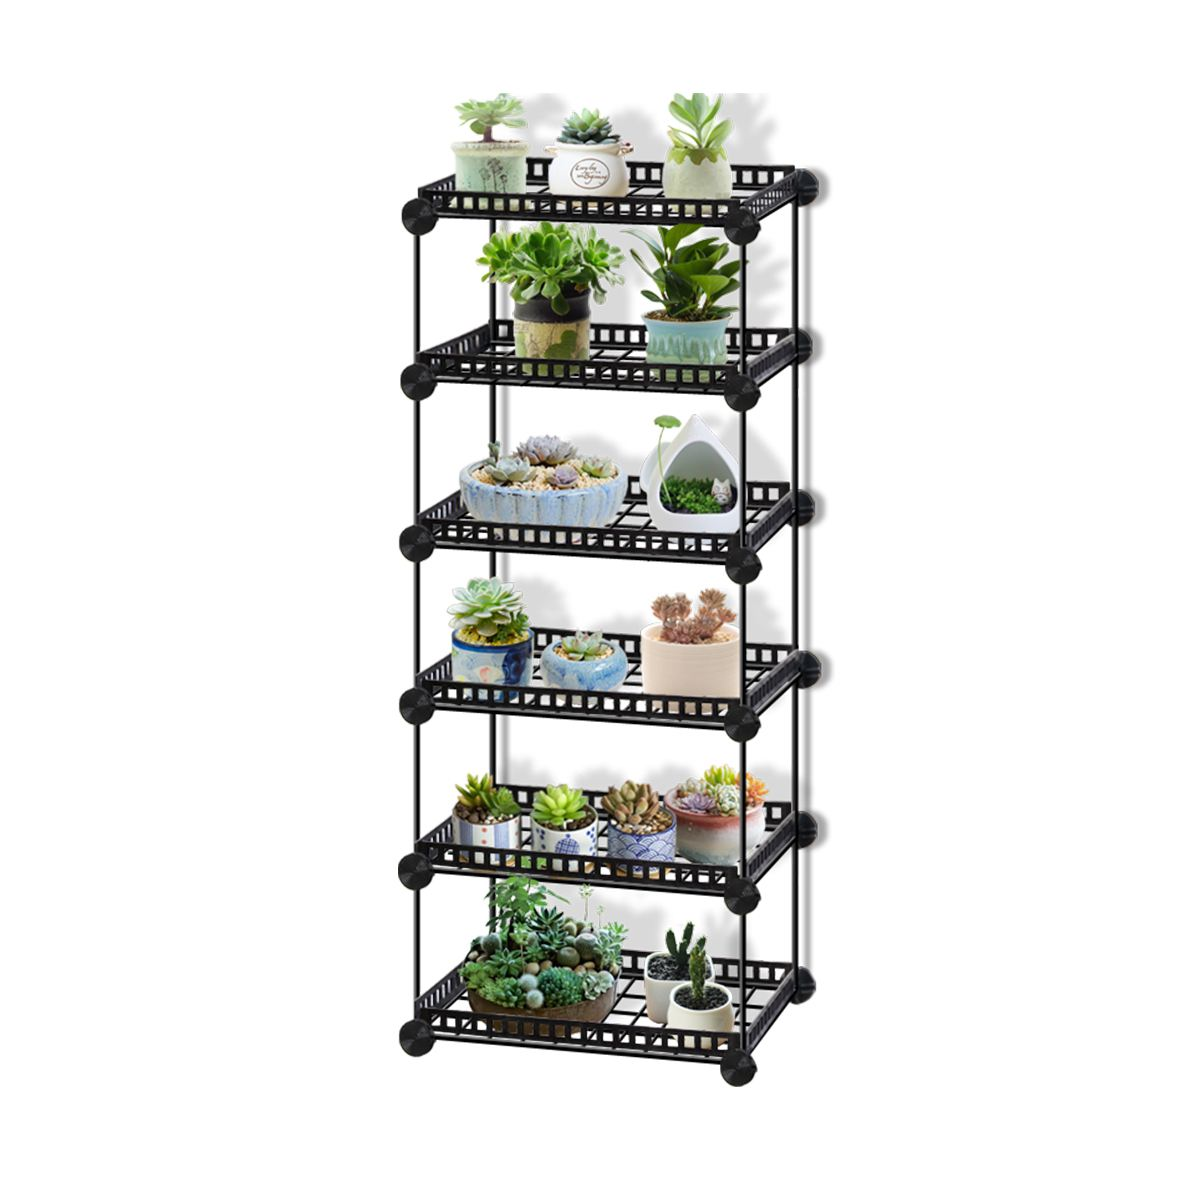 6/5/4/3 Tier Durable Metal Plant Shelves Flower pot holder Garden Rack Display Stand Succulent plants home Balcony Decoration